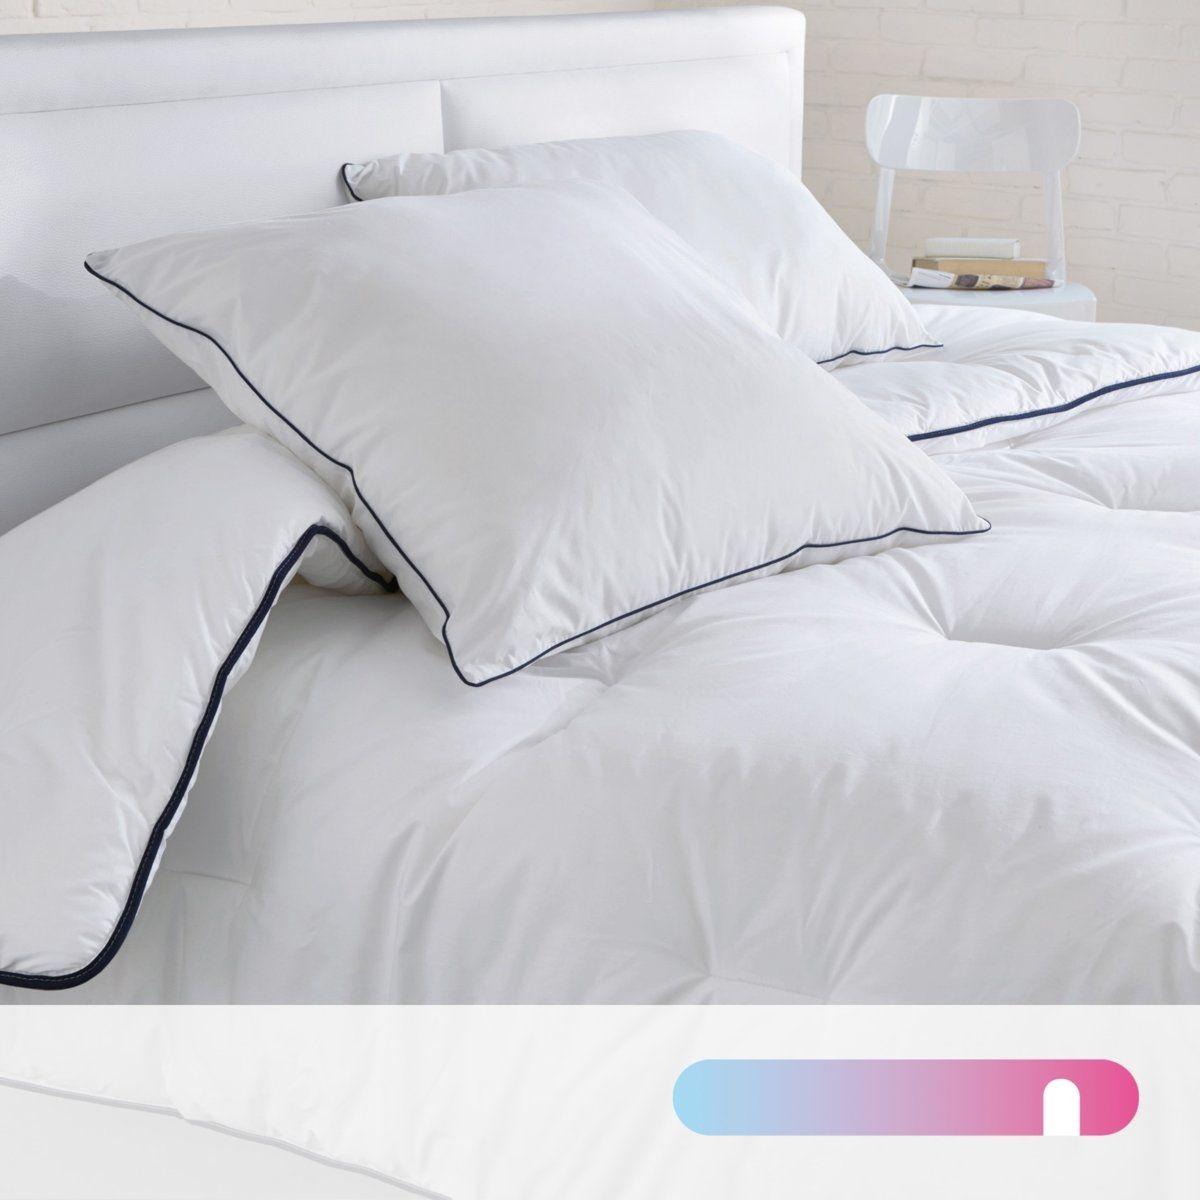 Couette polyester 500g/m2, traitée anti acariens